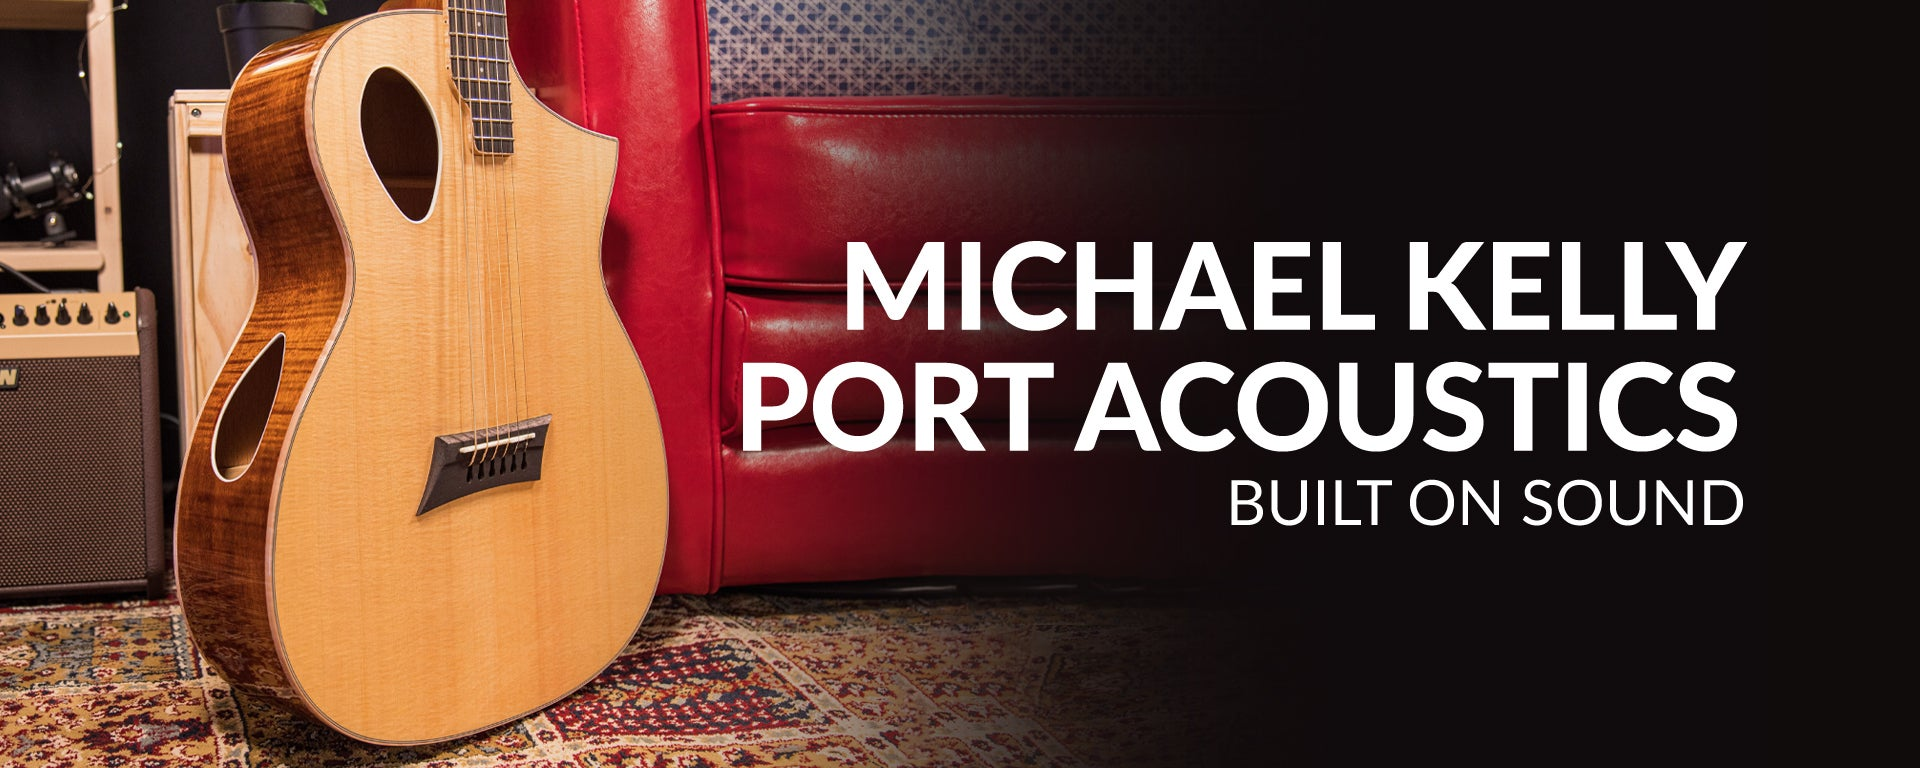 Michael Kelly Port Acoustics: Built On Sound